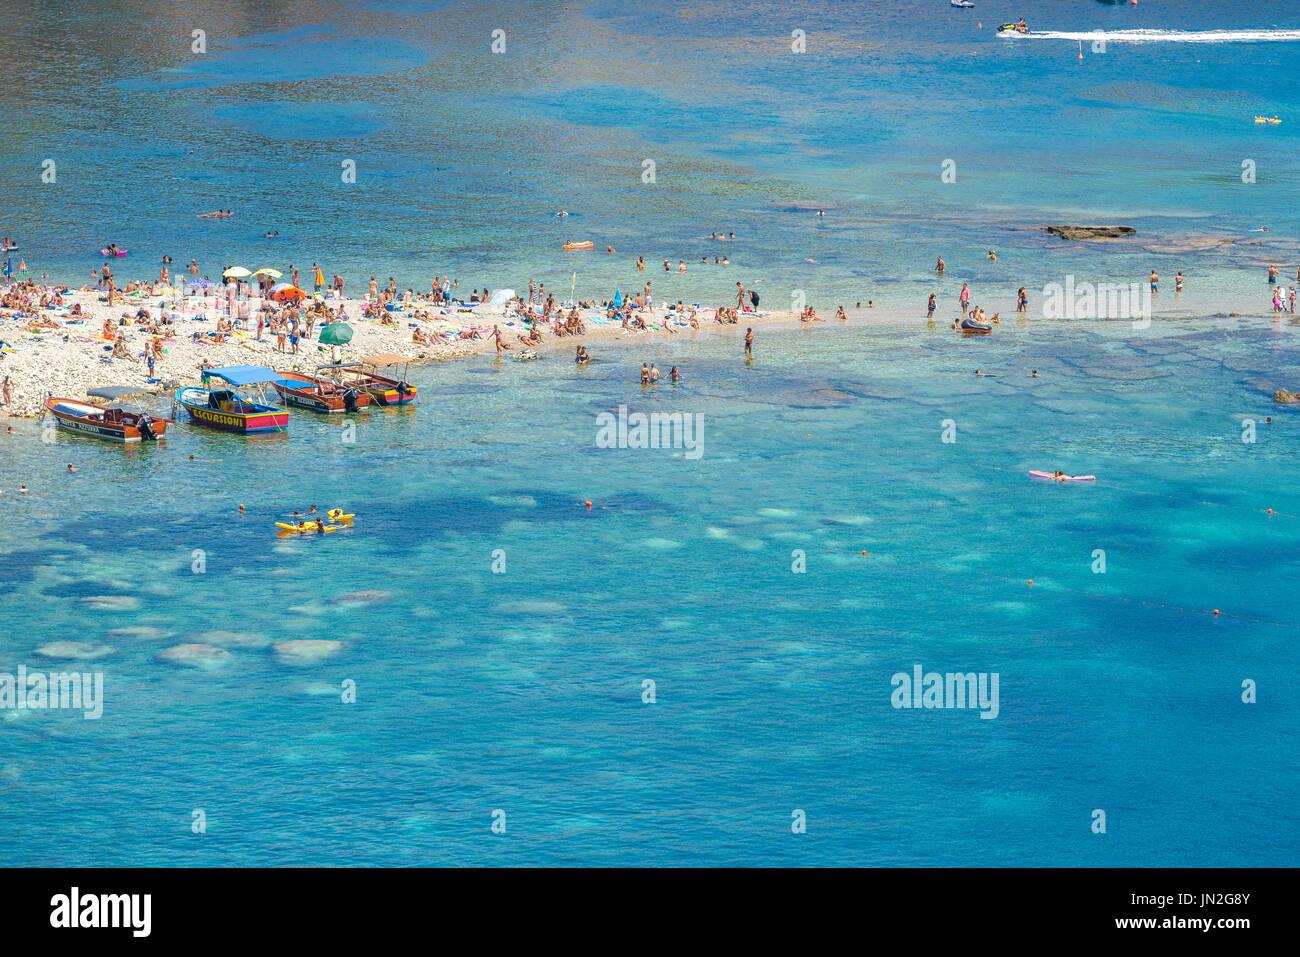 Mazzaro beach Sicily, view in summer of Mazzaro beach, a popular location near to Taormina for those keen to sunbathe or swim, Sicily. Stock Photo